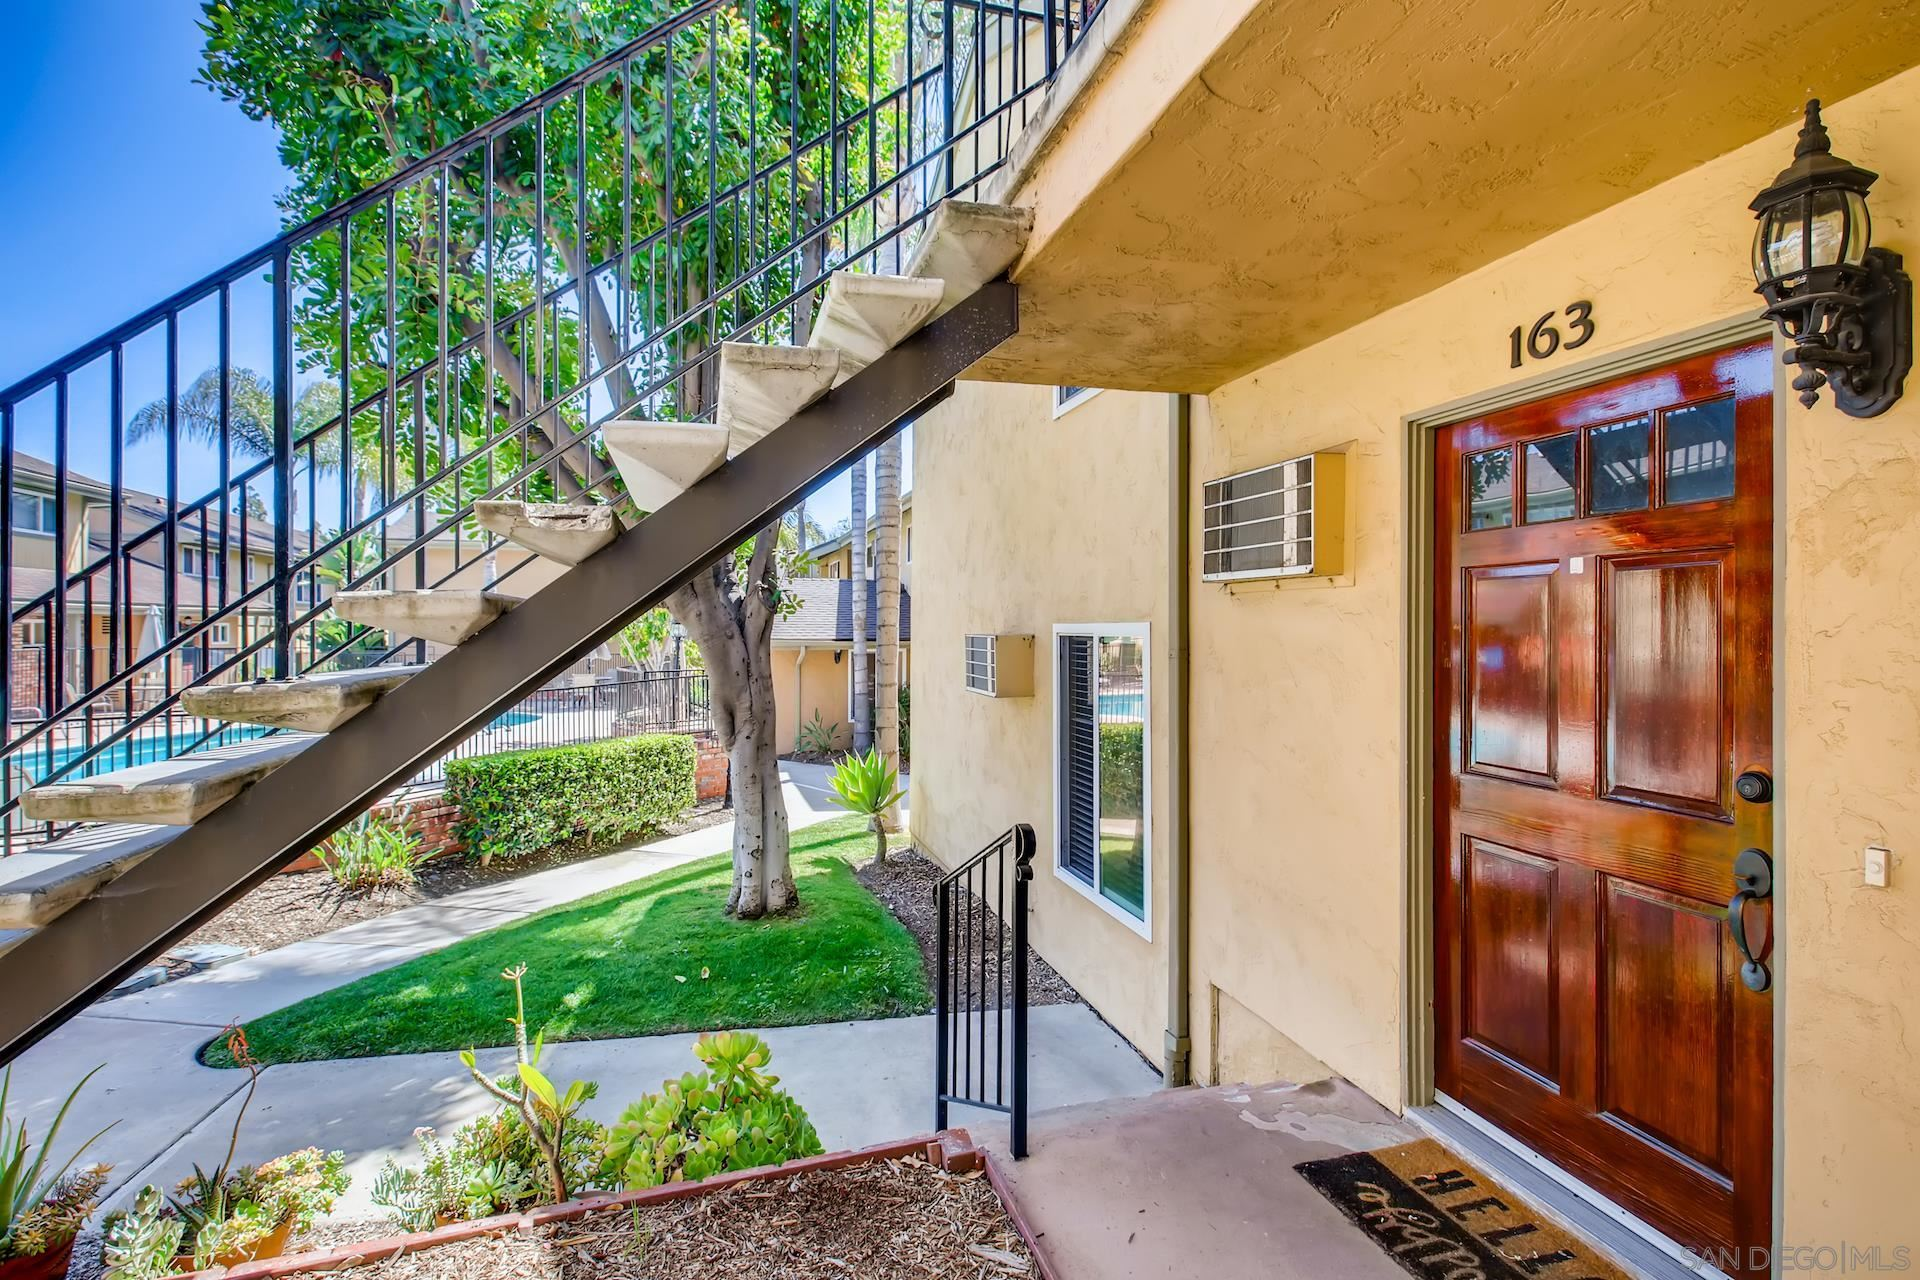 Photo of 4849 Williamsburg Ln #163, La Mesa, CA 91942 (MLS # 210009258)